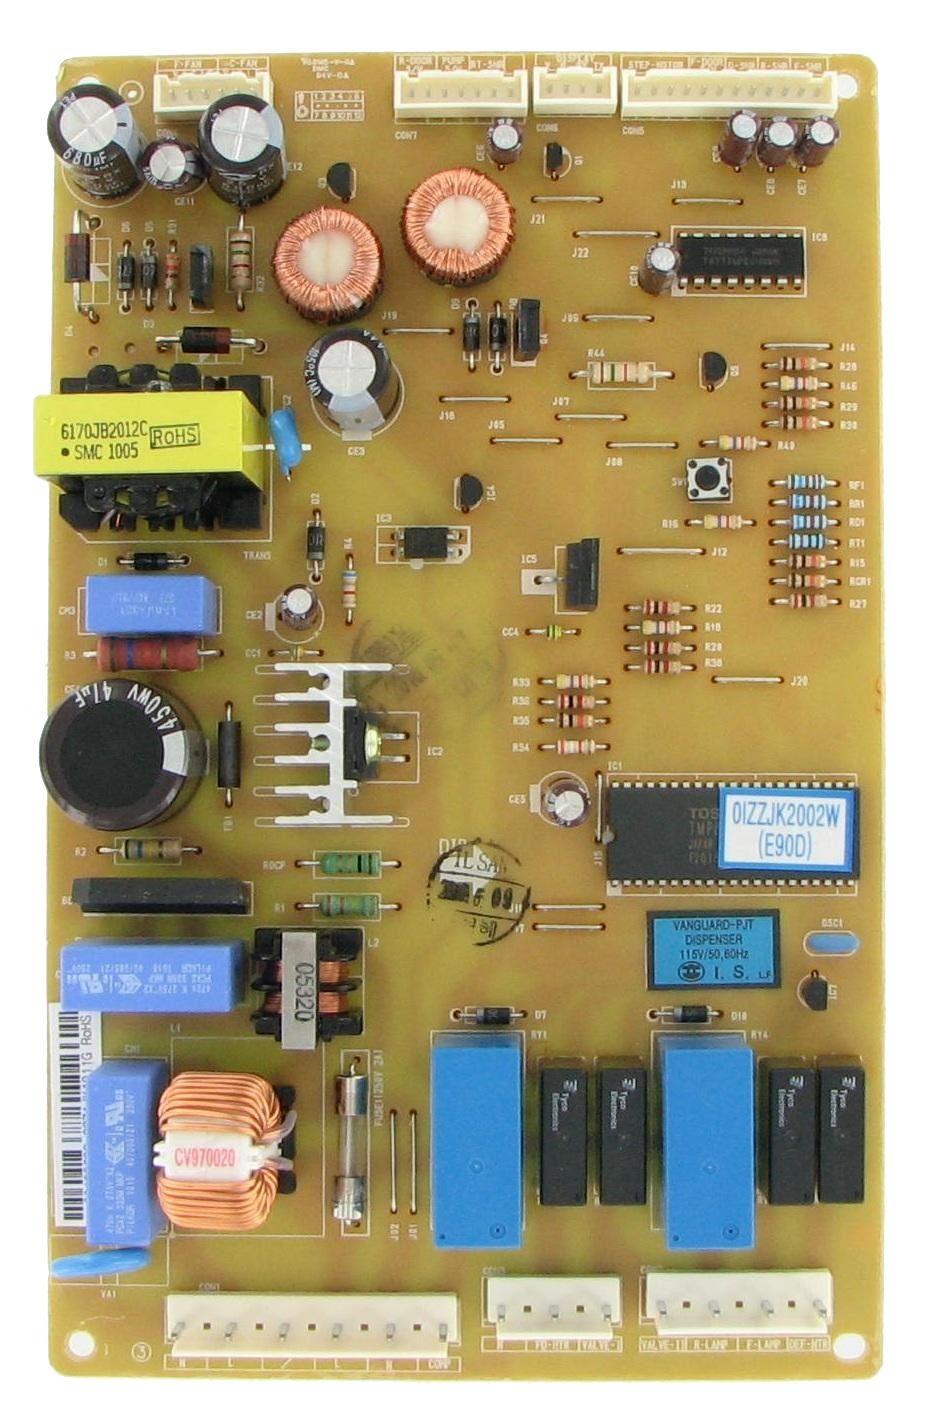 Lg 6871jk1011g Refrigeration Electronic Control Board Refrigerator Lg Refrigerator Models Boards